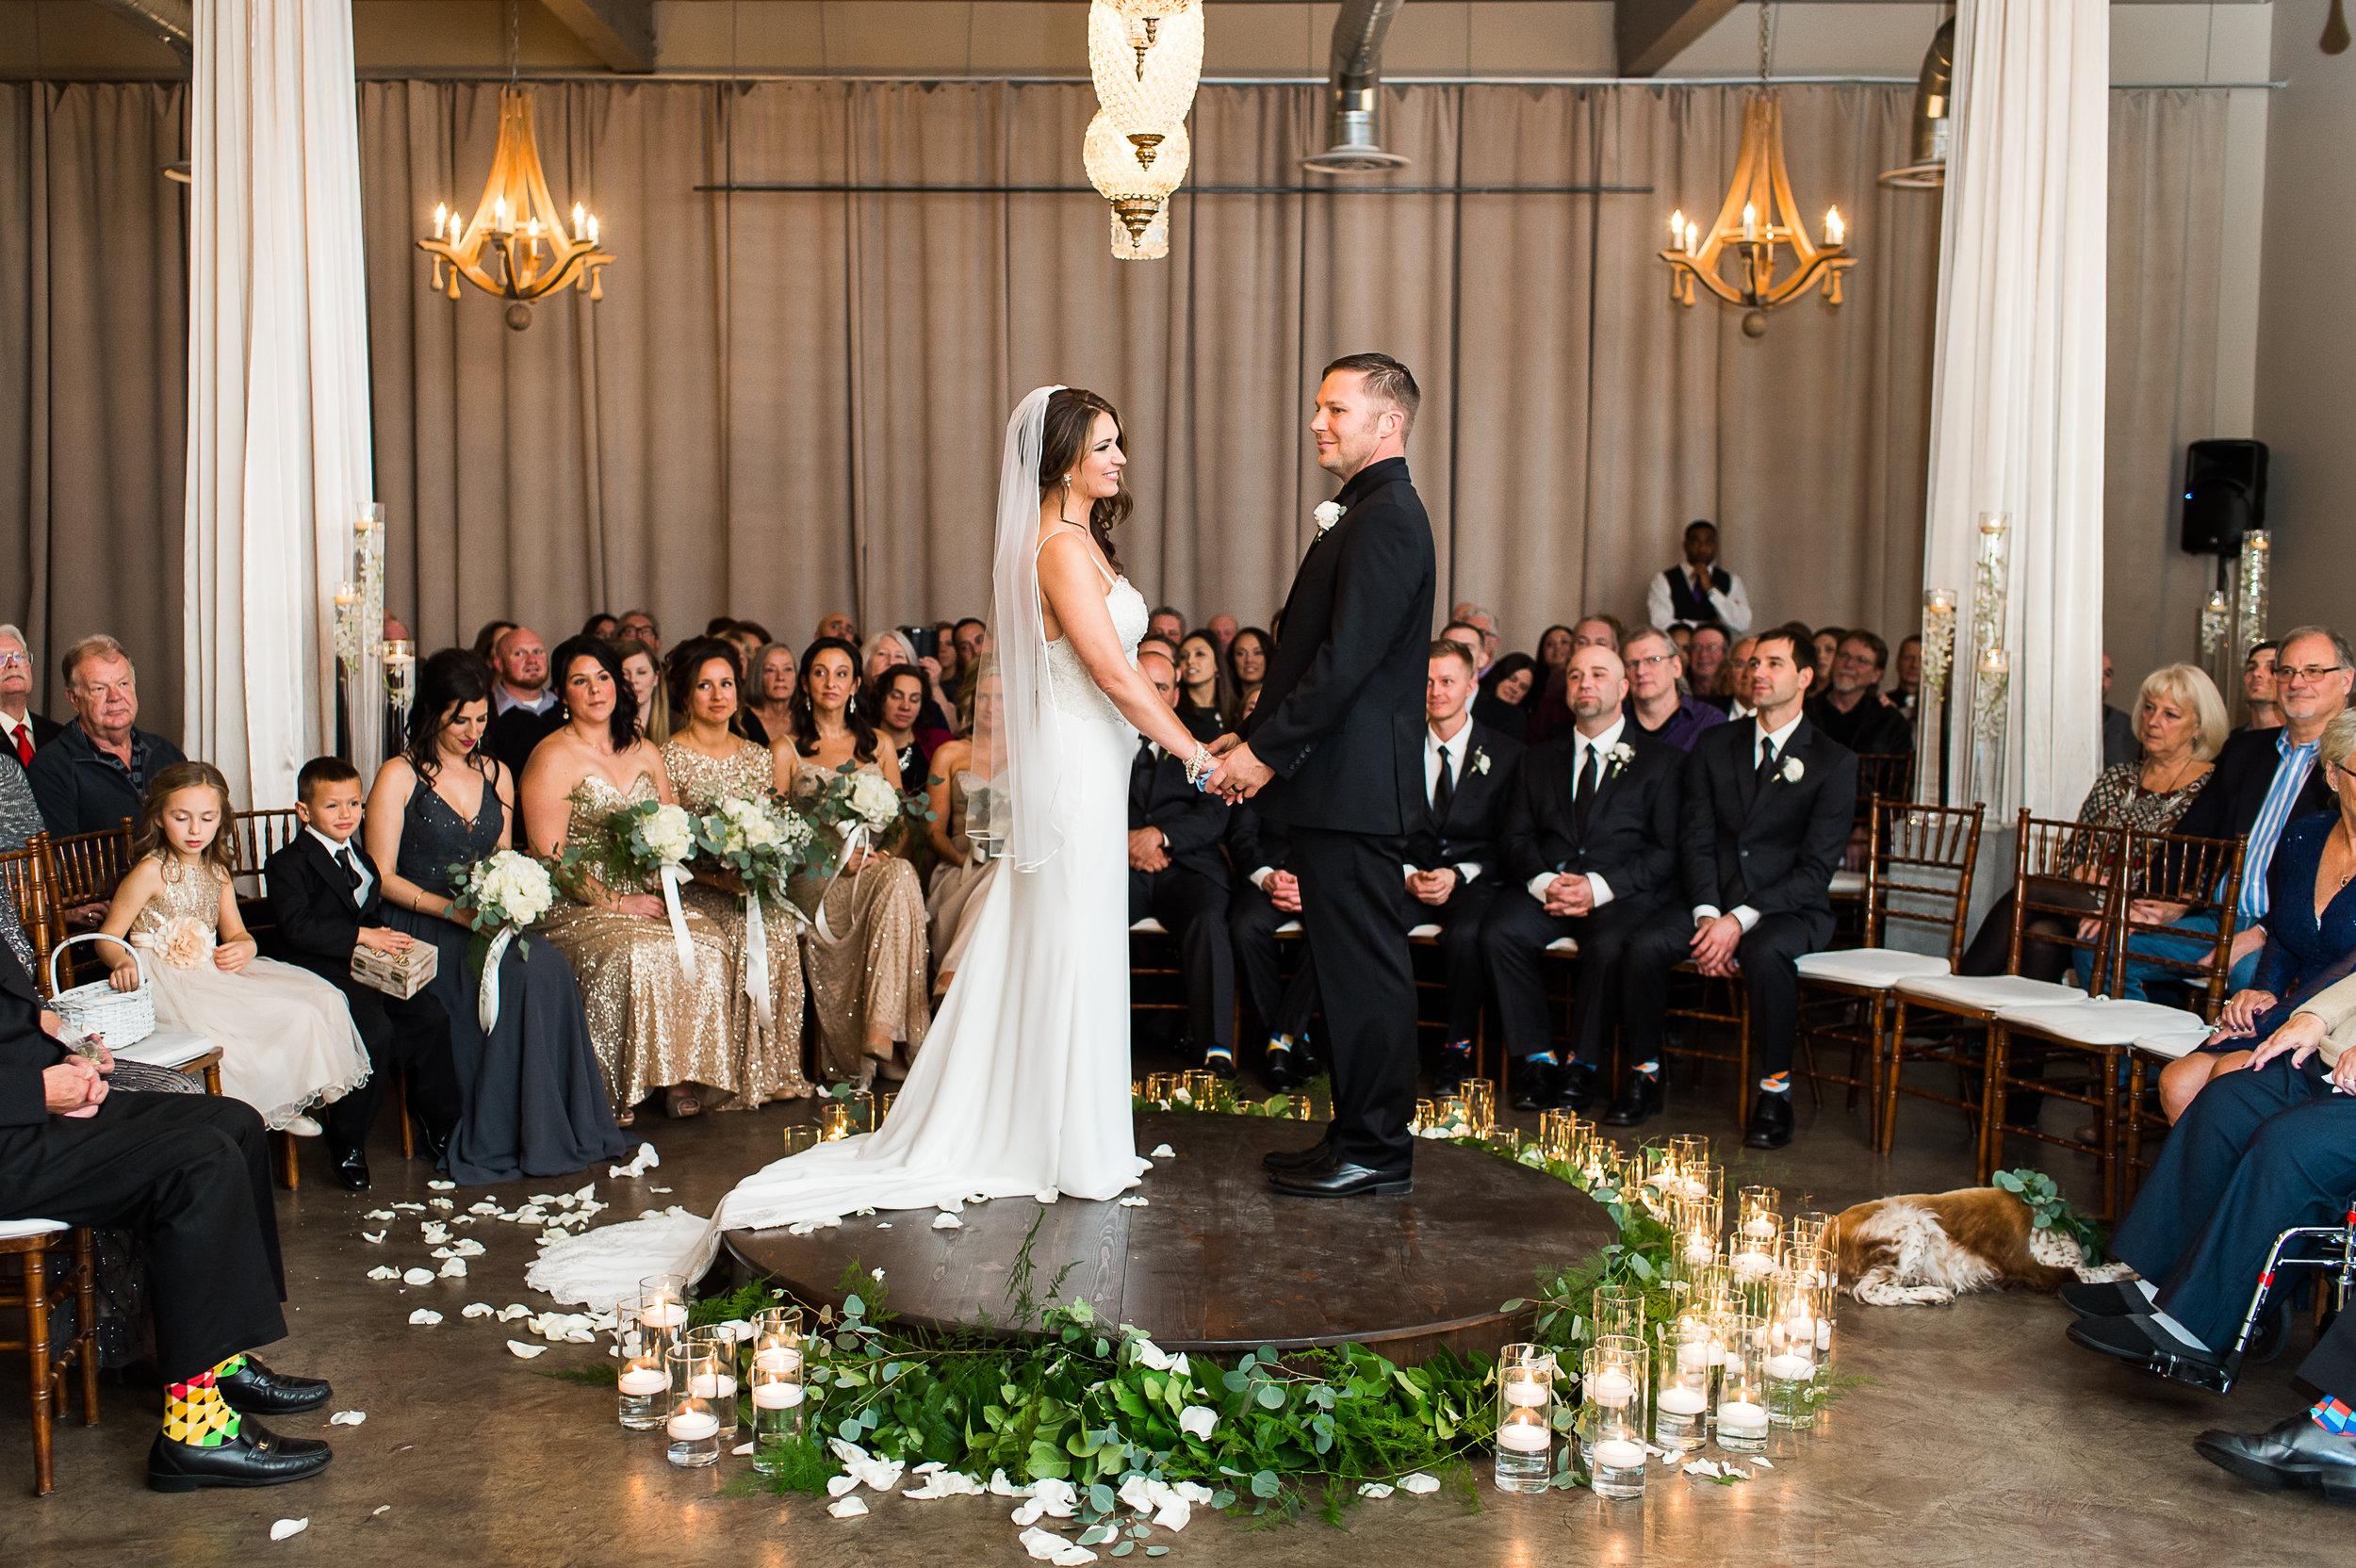 JJ-wedding-Van-Wyhe-Photography-395.jpg